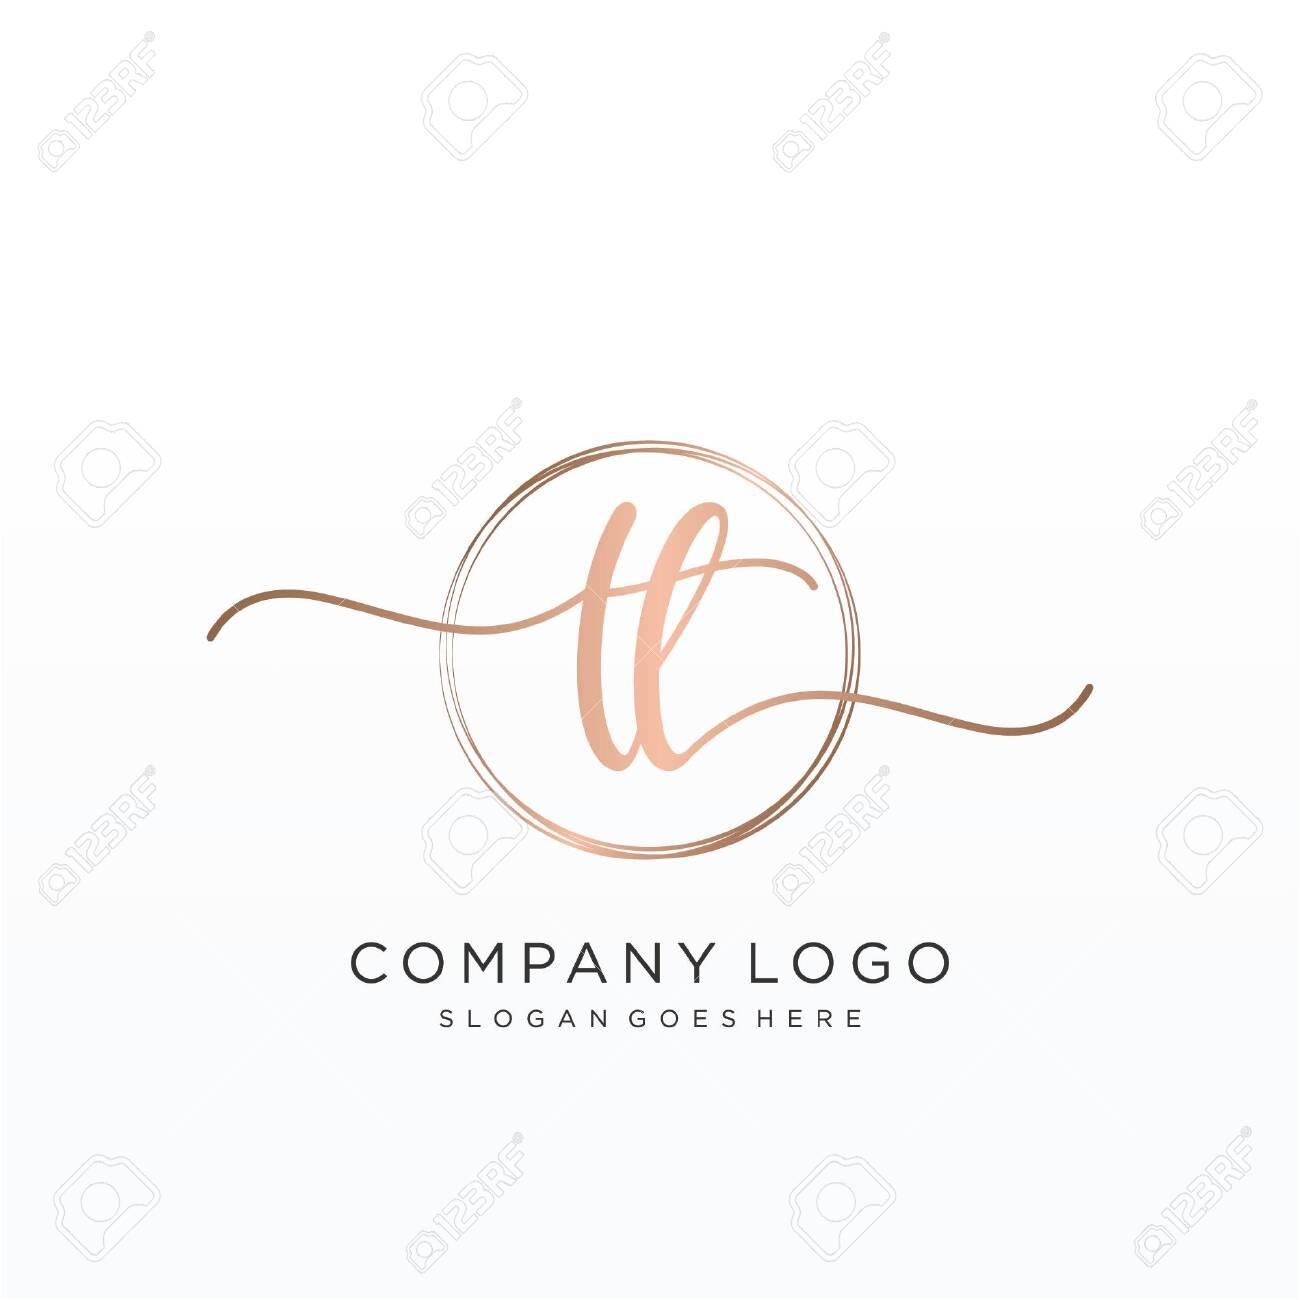 Initial handwriting logo design Beautyful designhandwritten logo for fashion, team, wedding, luxury logo. - 147880954